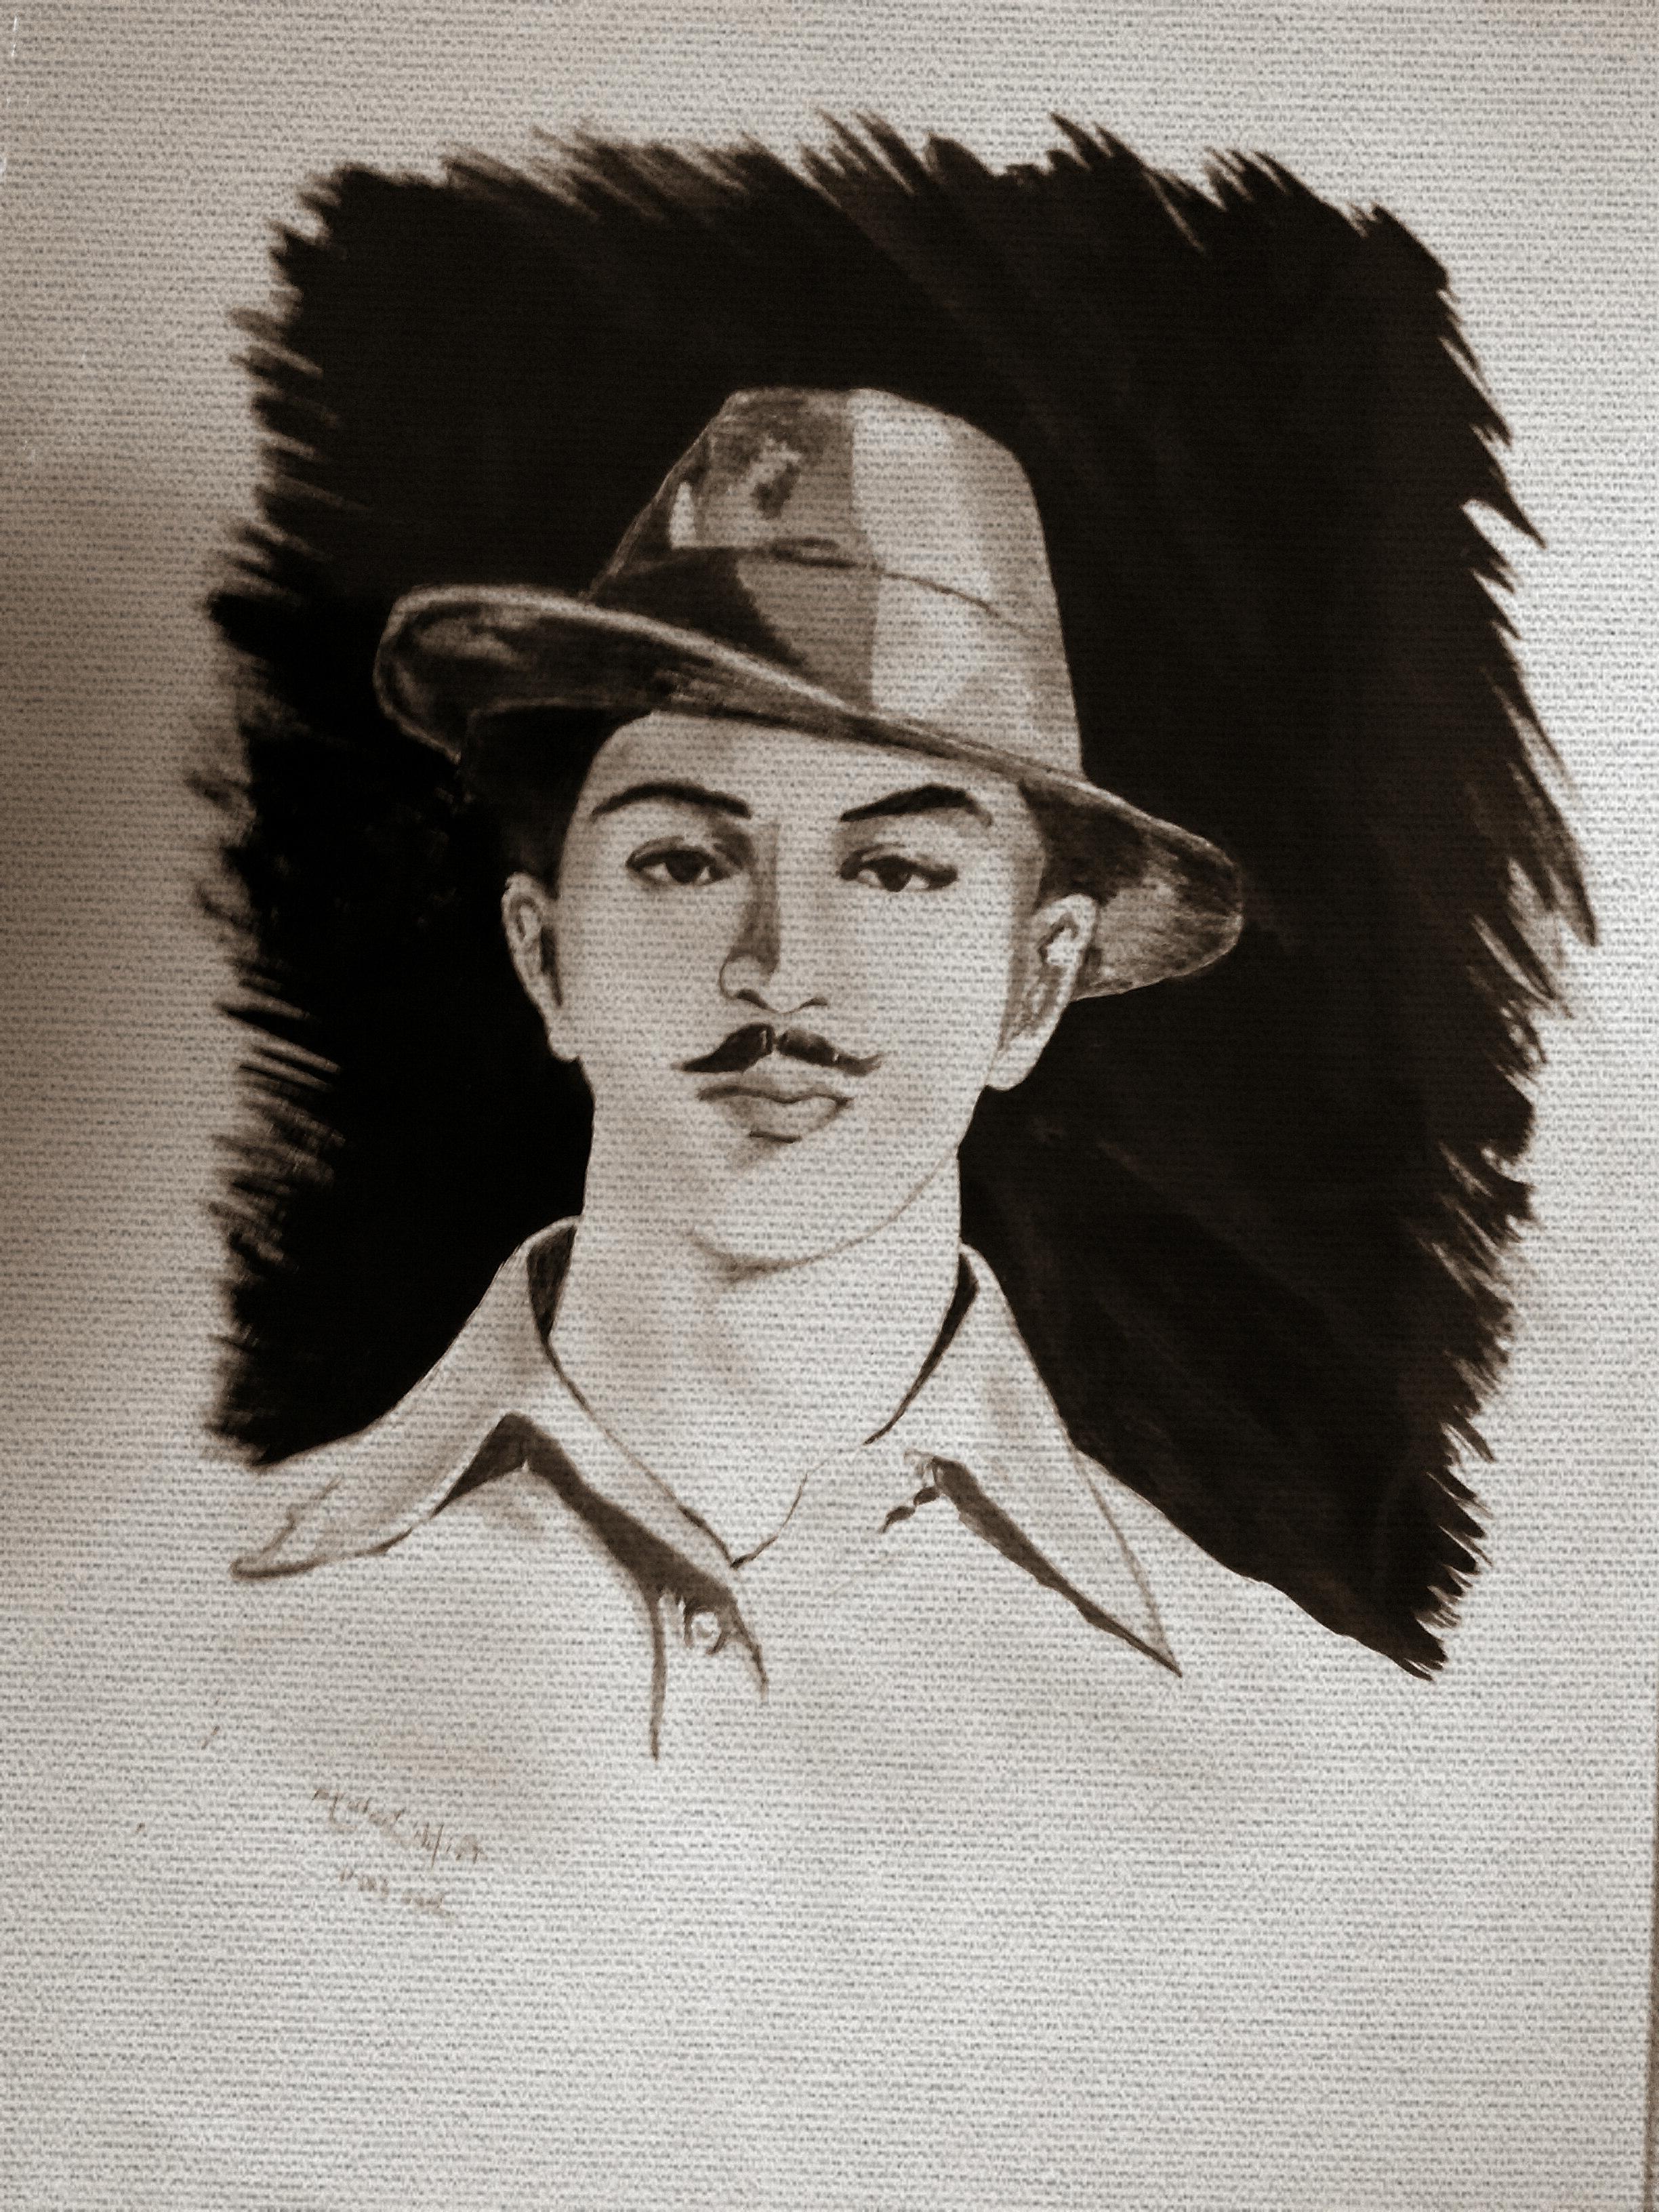 2448x3264 Pencil Sketch Of Bhagat Singh Drawing Bhagat Singh Human Faces